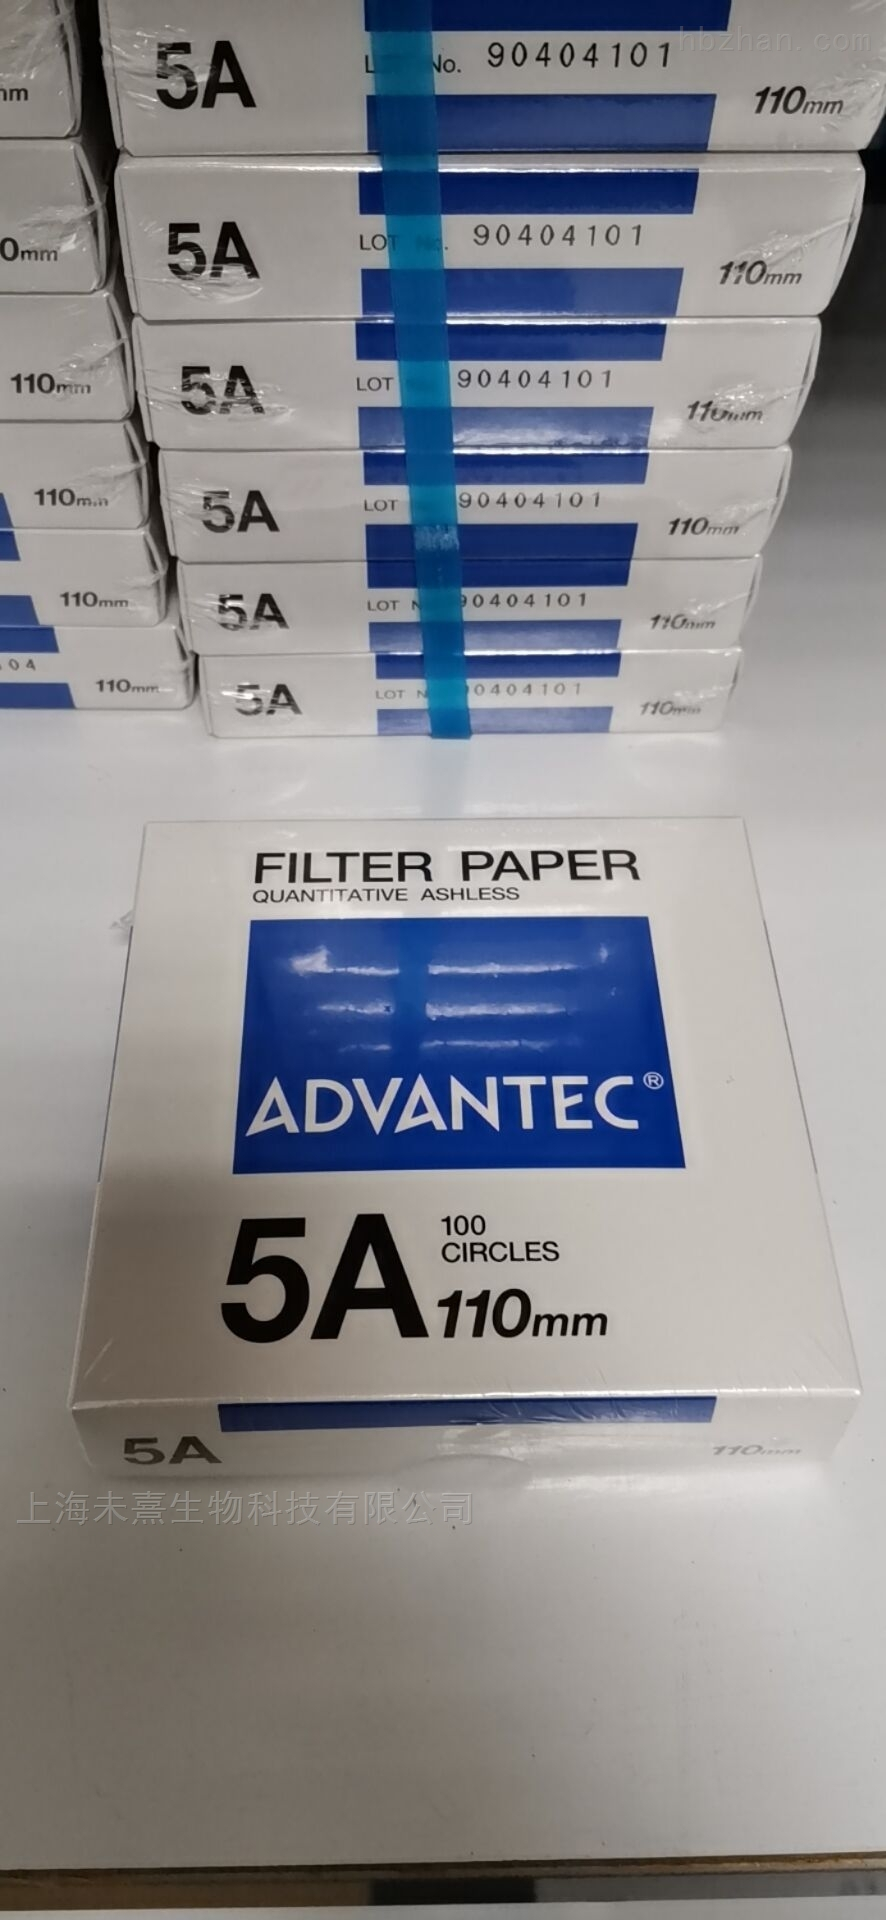 ADVANTEC东洋5A定量滤纸110mm直径